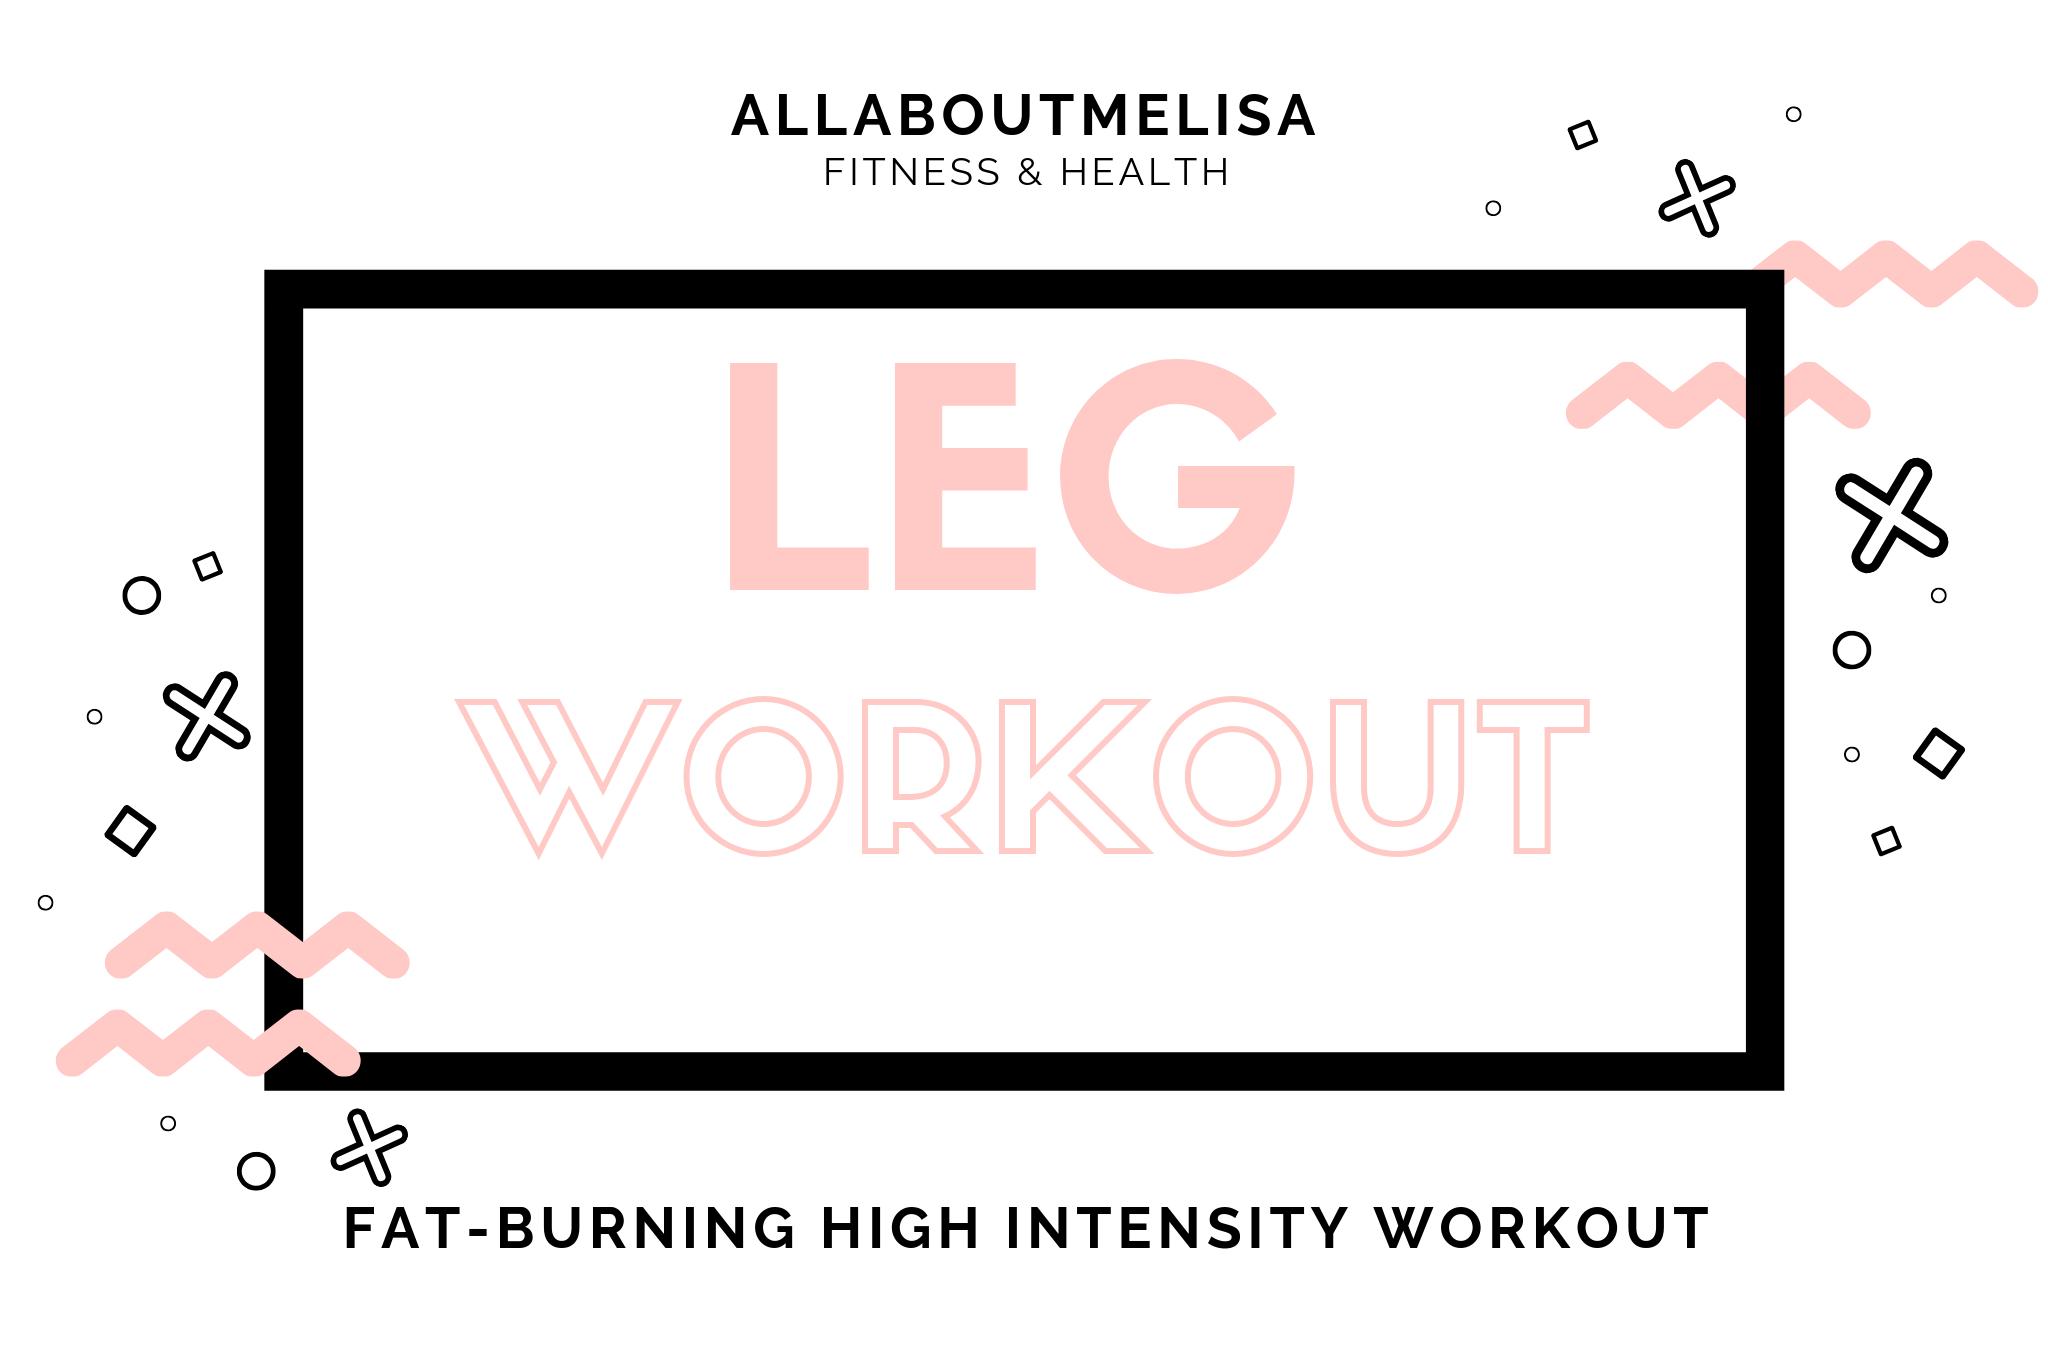 hiit high intensity leg workout leg focused cardio circle fitness